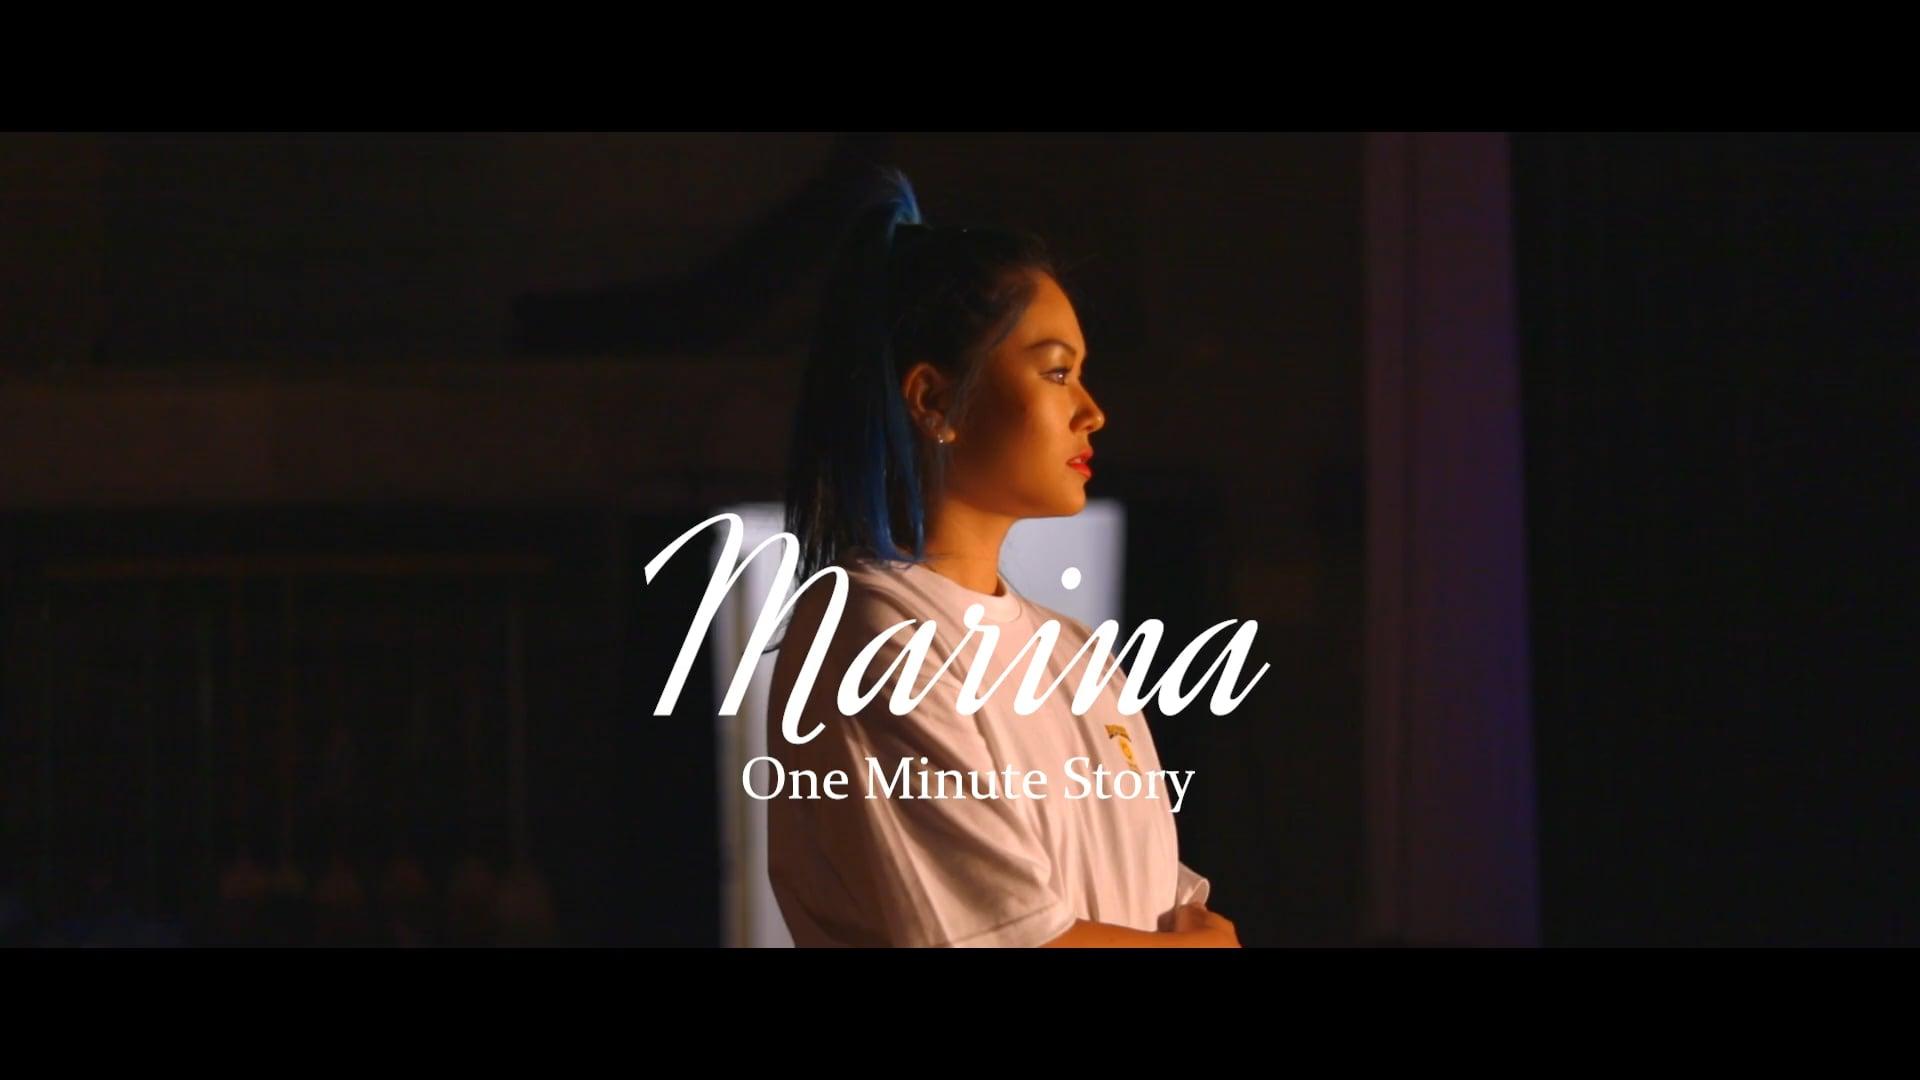 One Minute Story x Marina